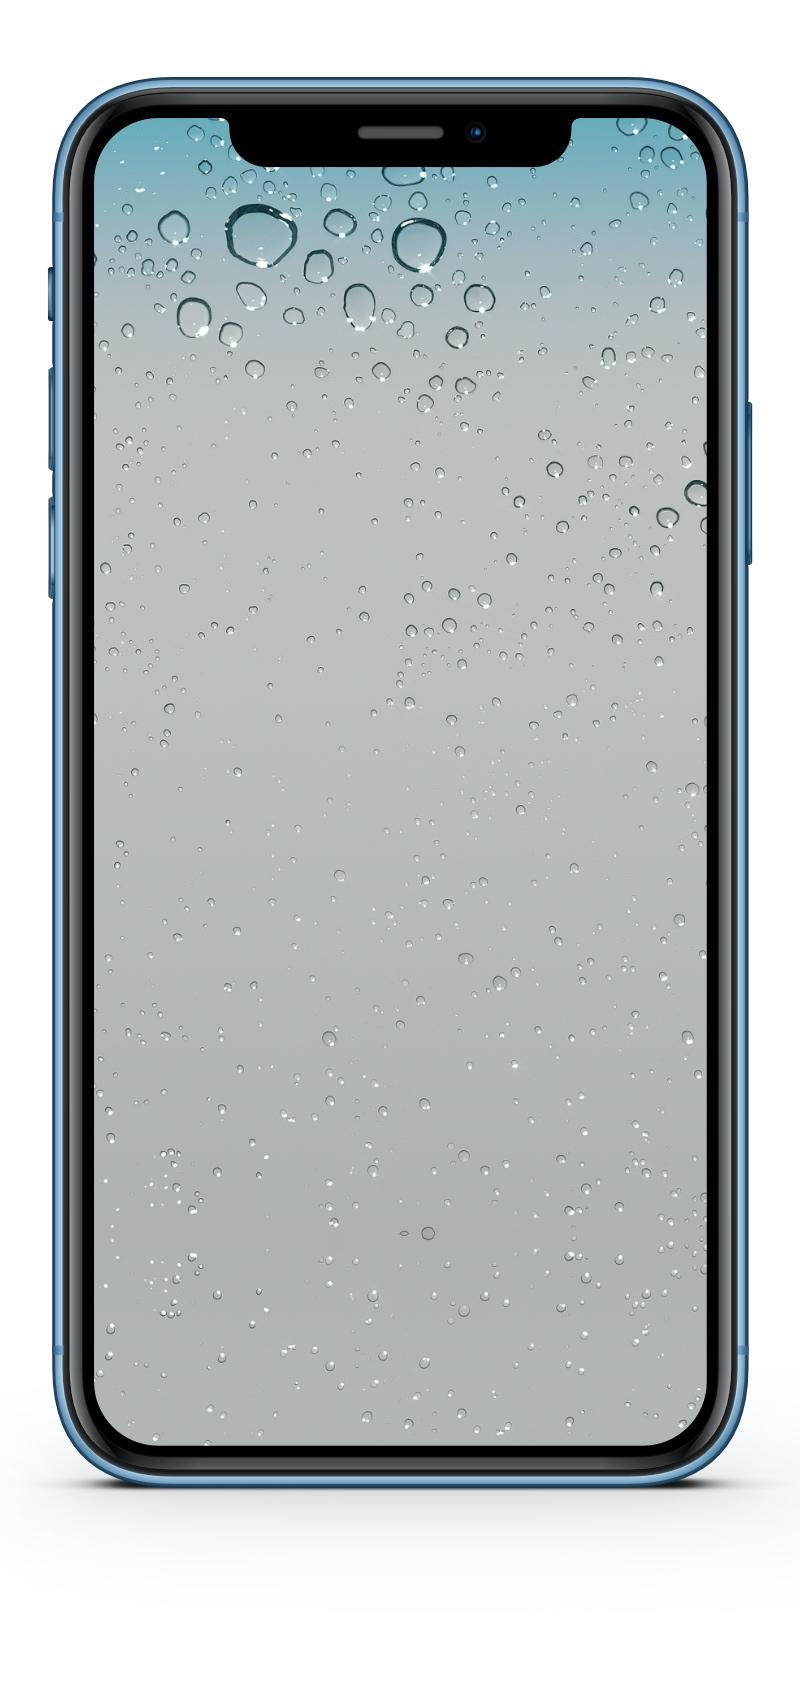 "Hintergrundbild (Wallpaper) ""iPhone 4"" (iOS 5) optimiert für iPhone XR"